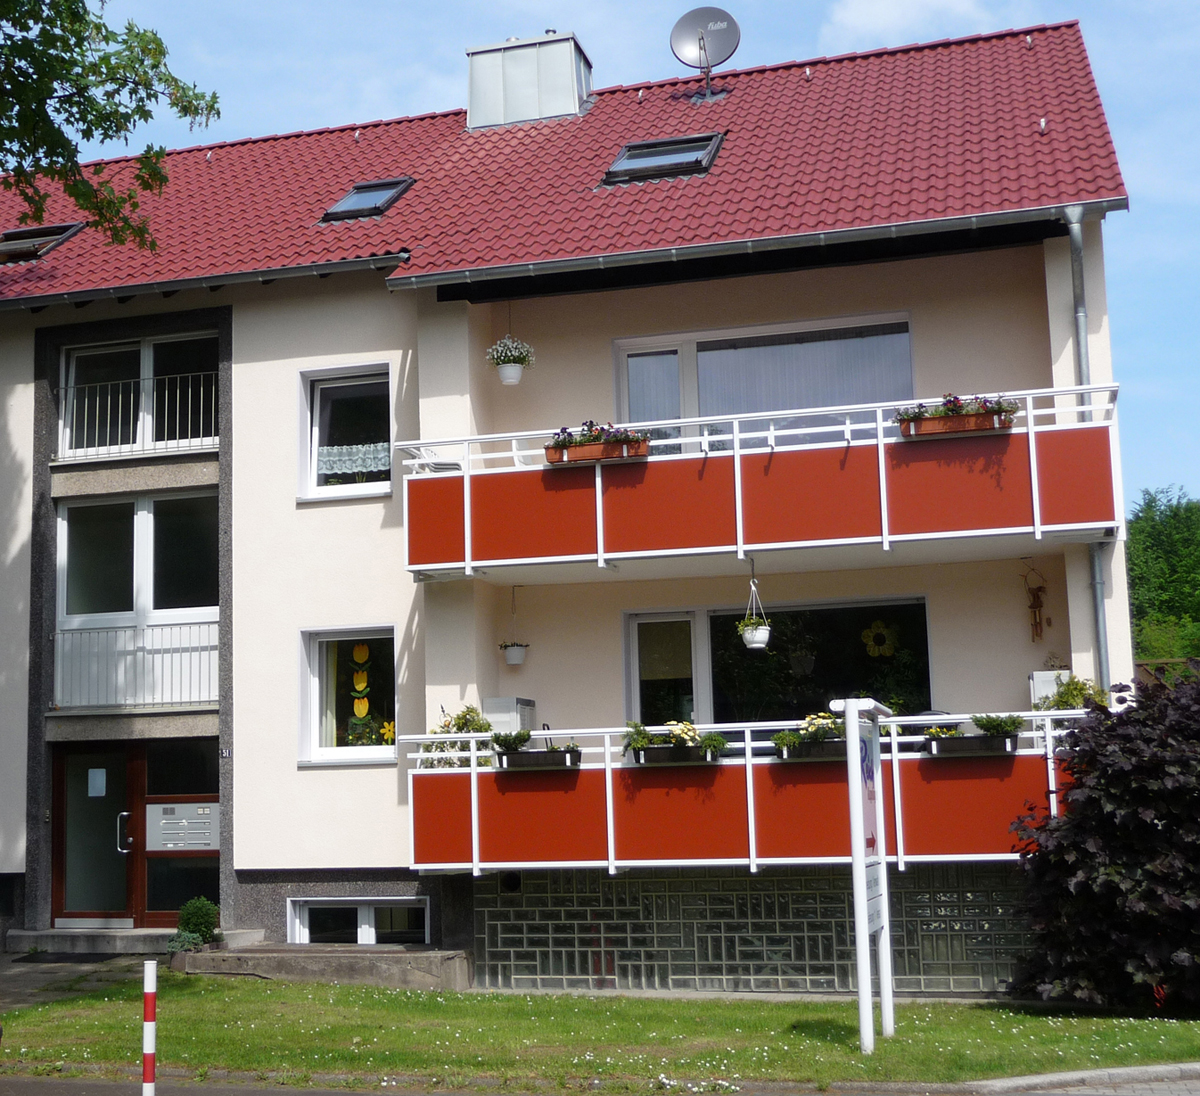 Fassade mit Balkon Hugo Groll Malerbetrieb Bochum